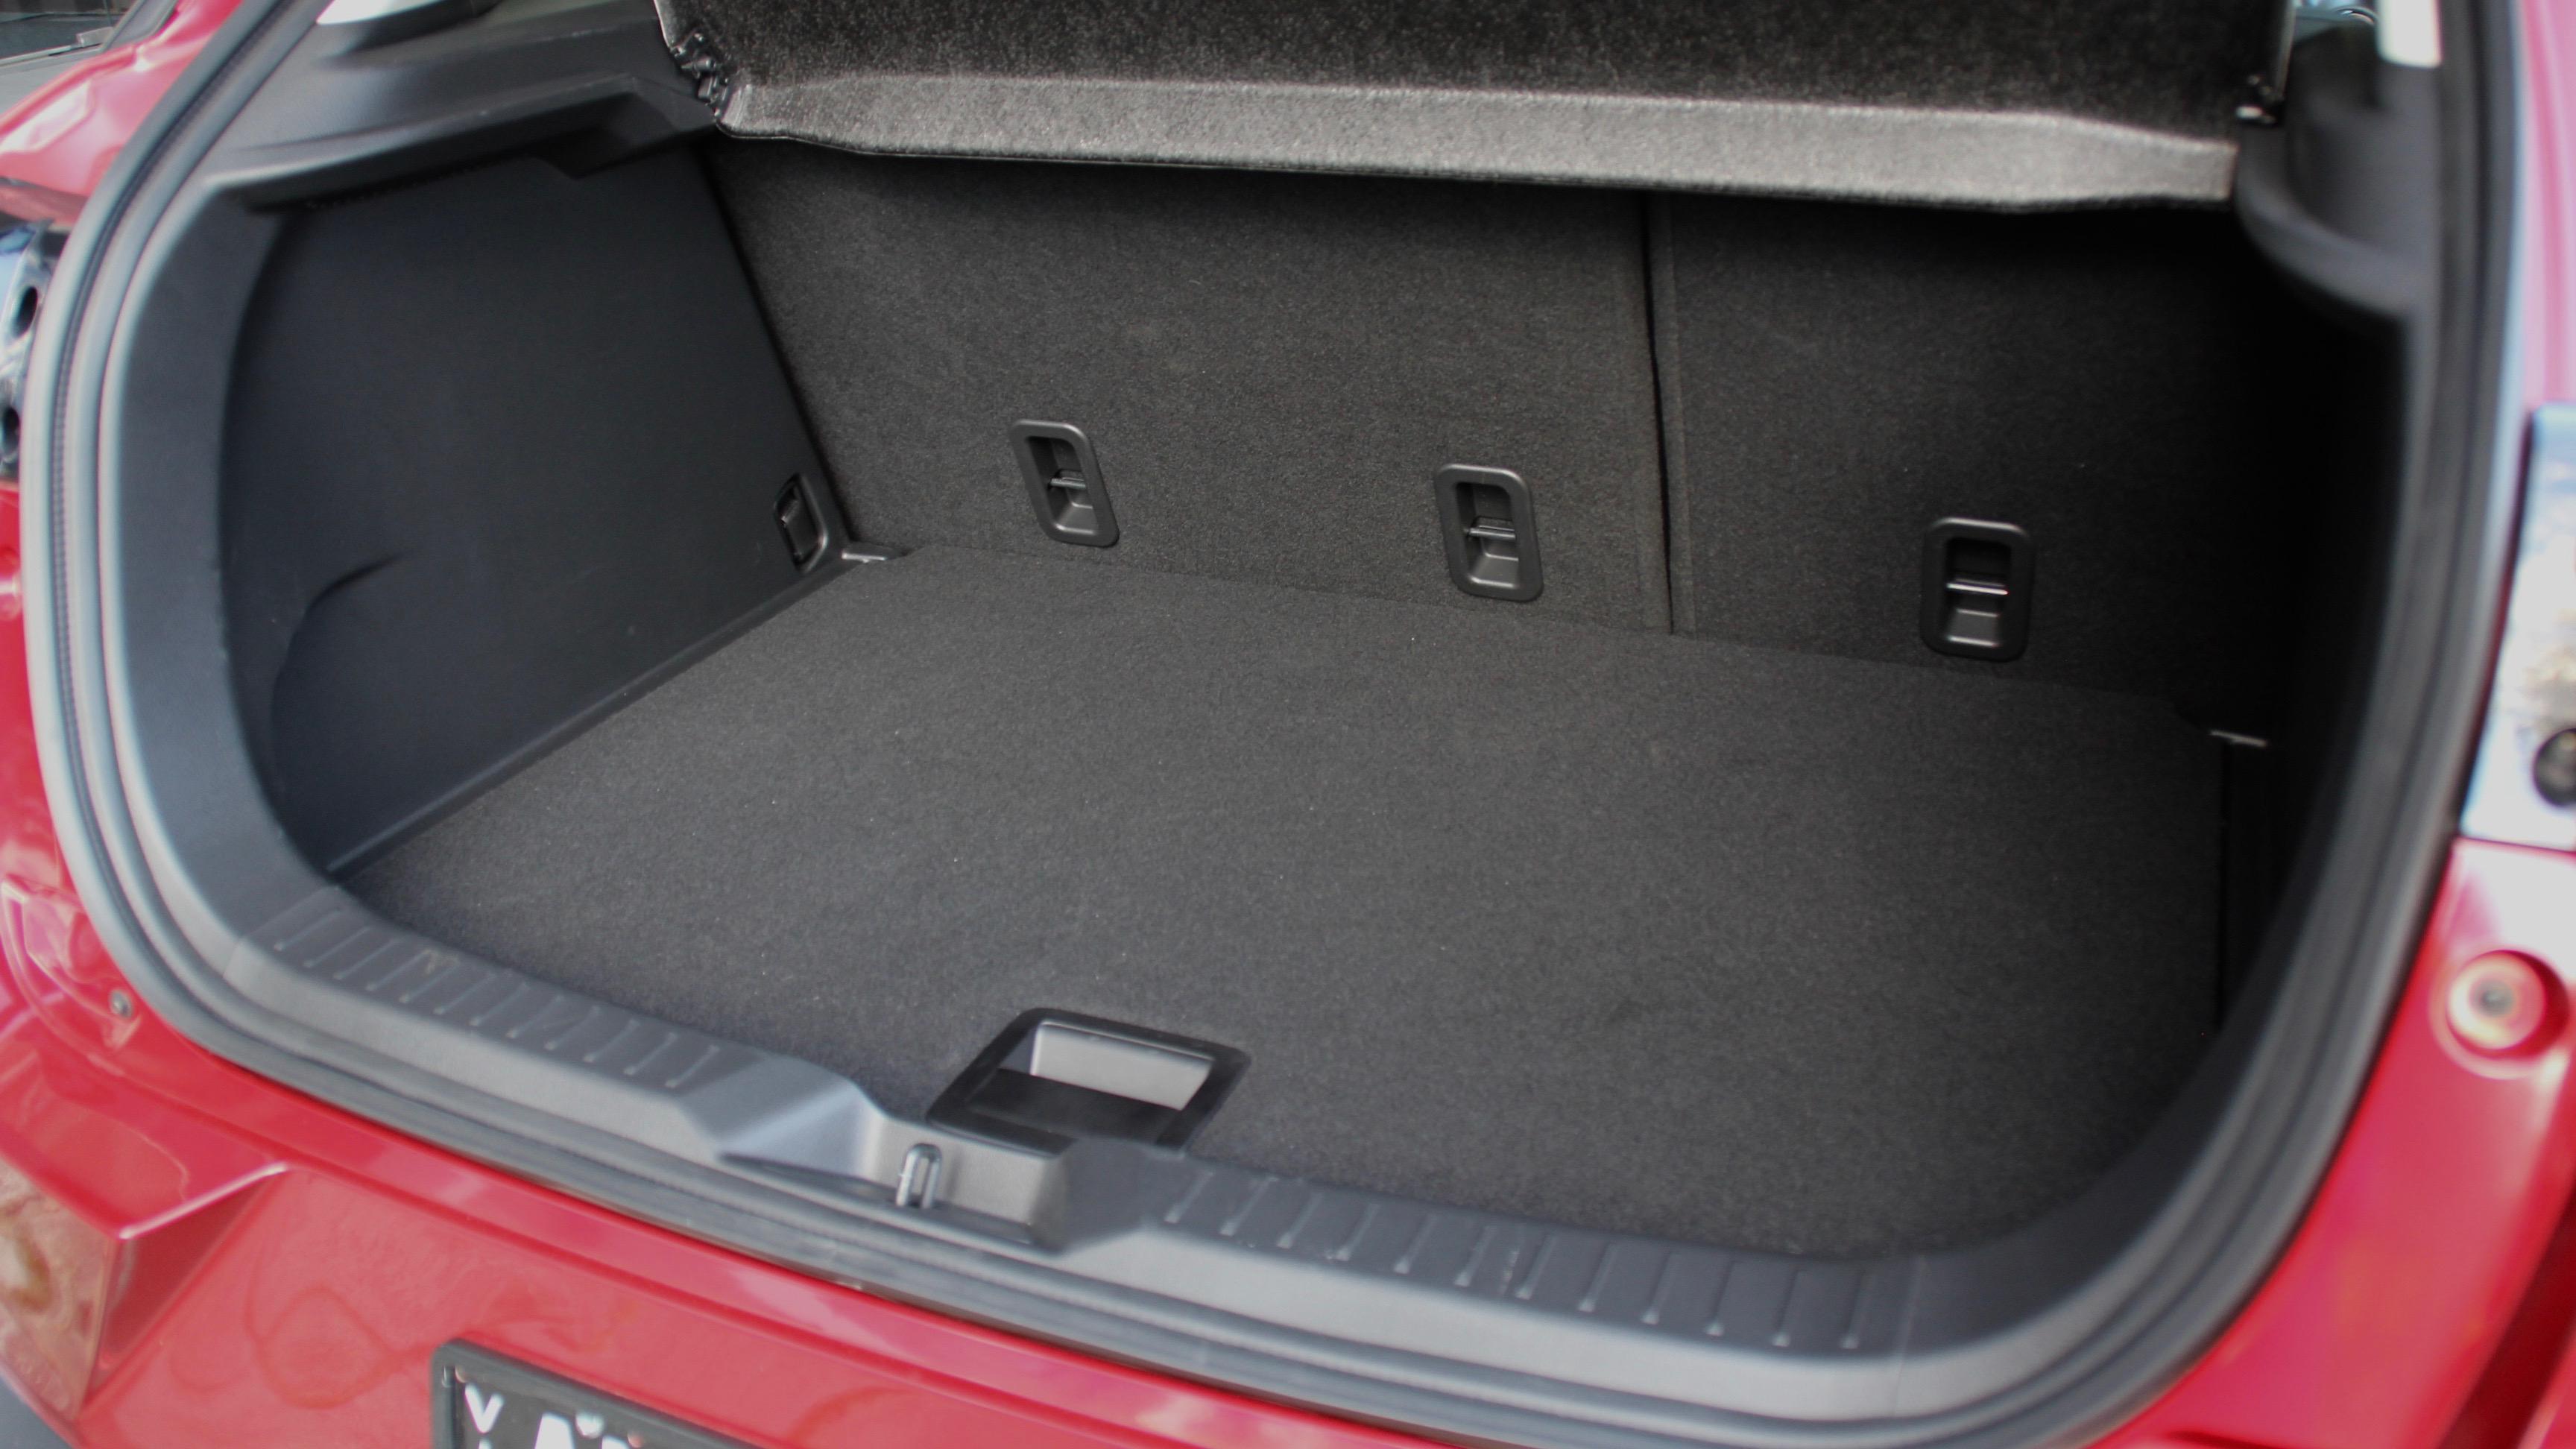 2018 Mazda CX-3 boot